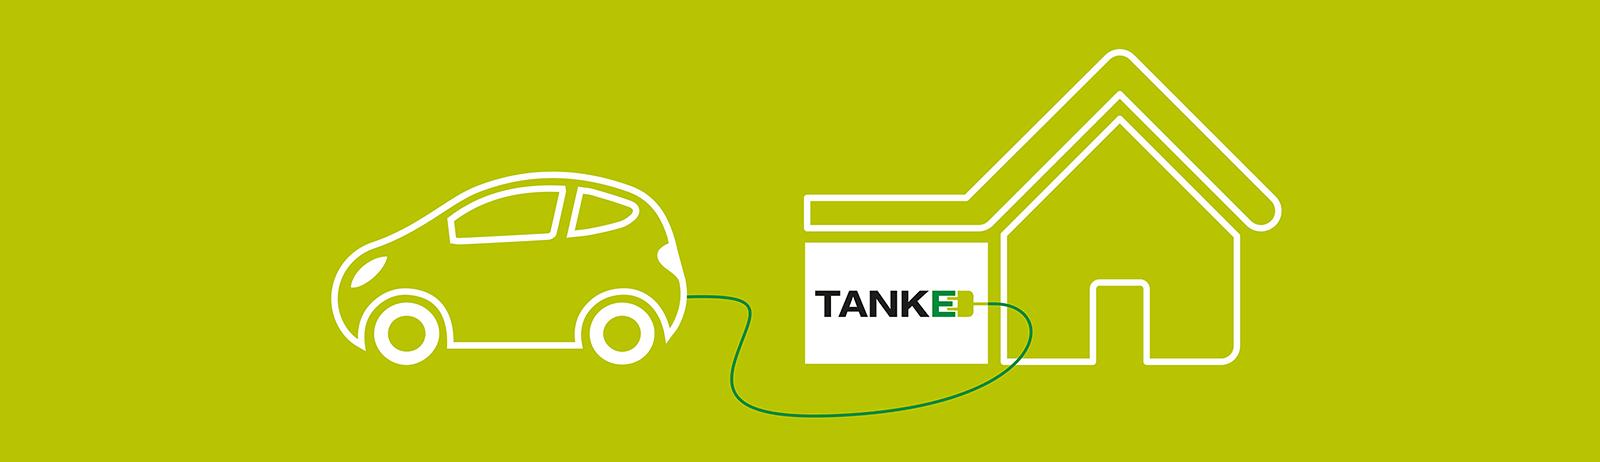 TankE zuhause -Wallboxpaket der Stadtwerke Solingen